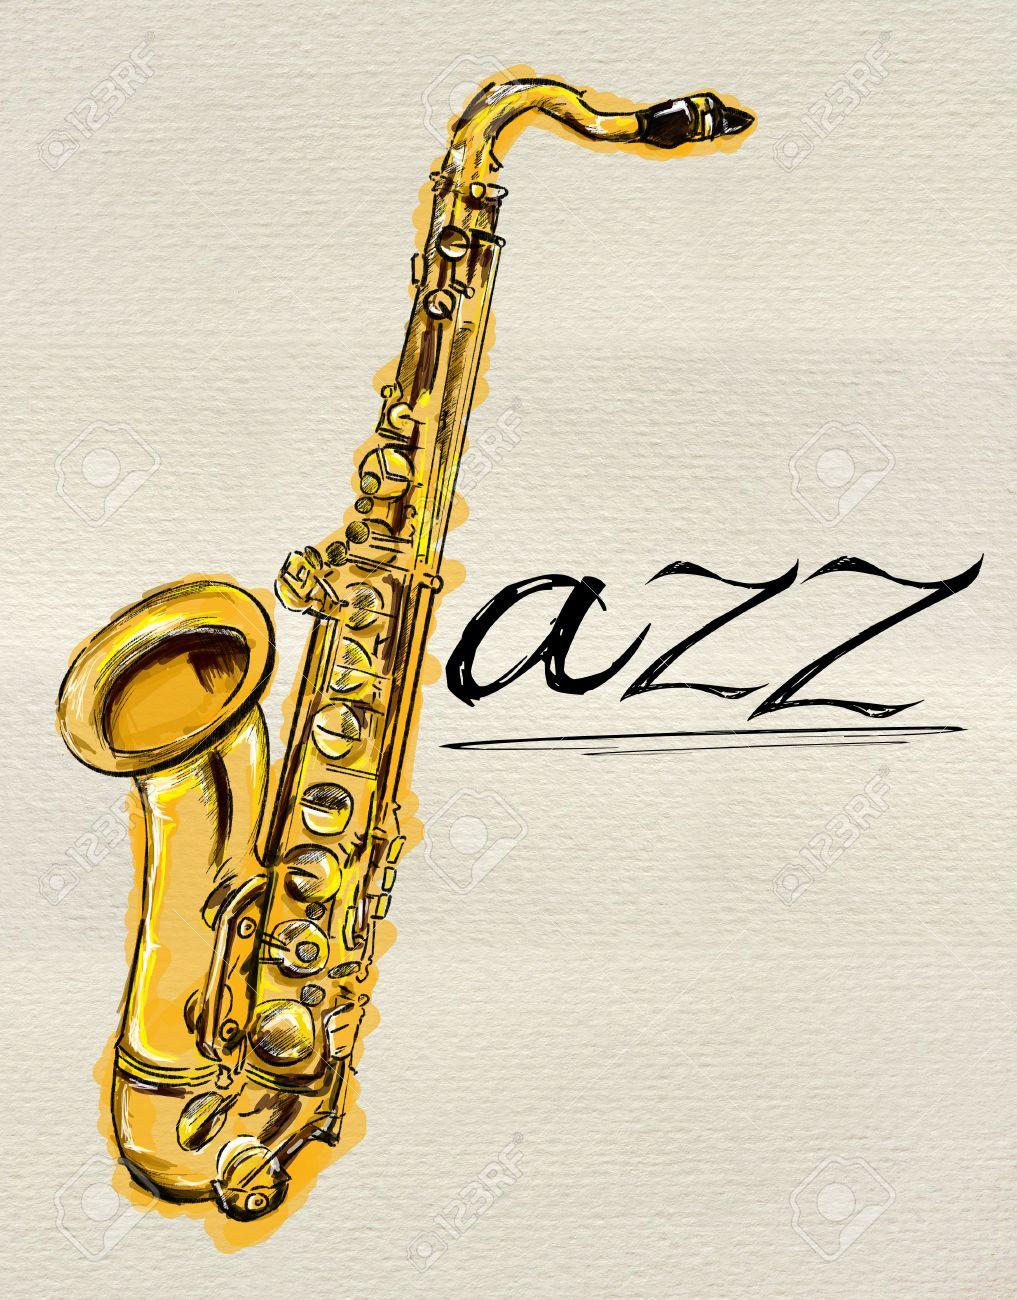 Jazz Saxophone Painting Stock Photo - 24497682